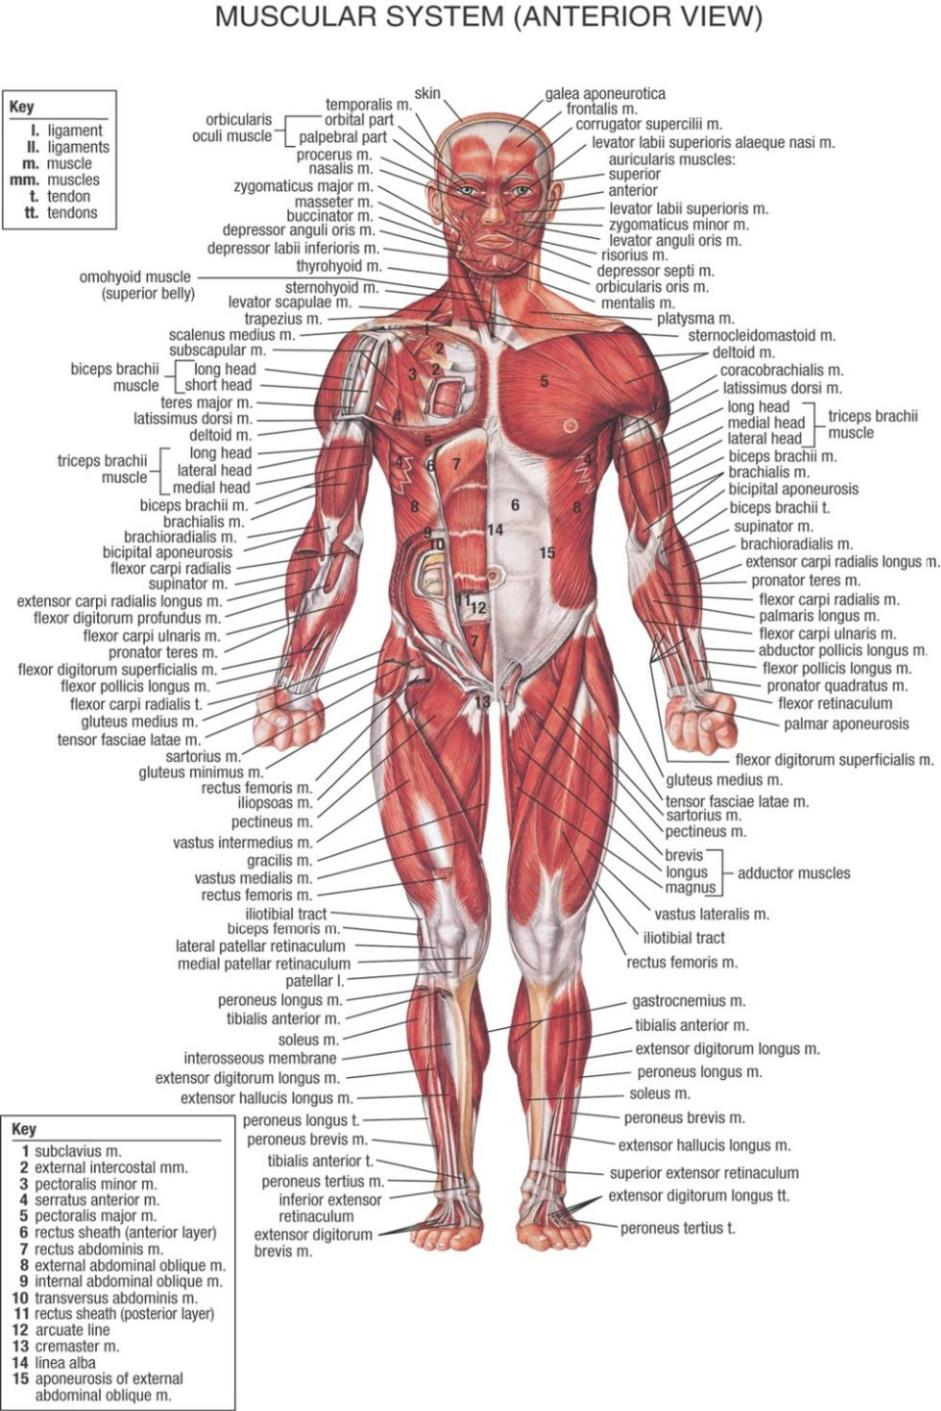 Human Body Anatomical Chart Muscular System Watercolor Inkjet